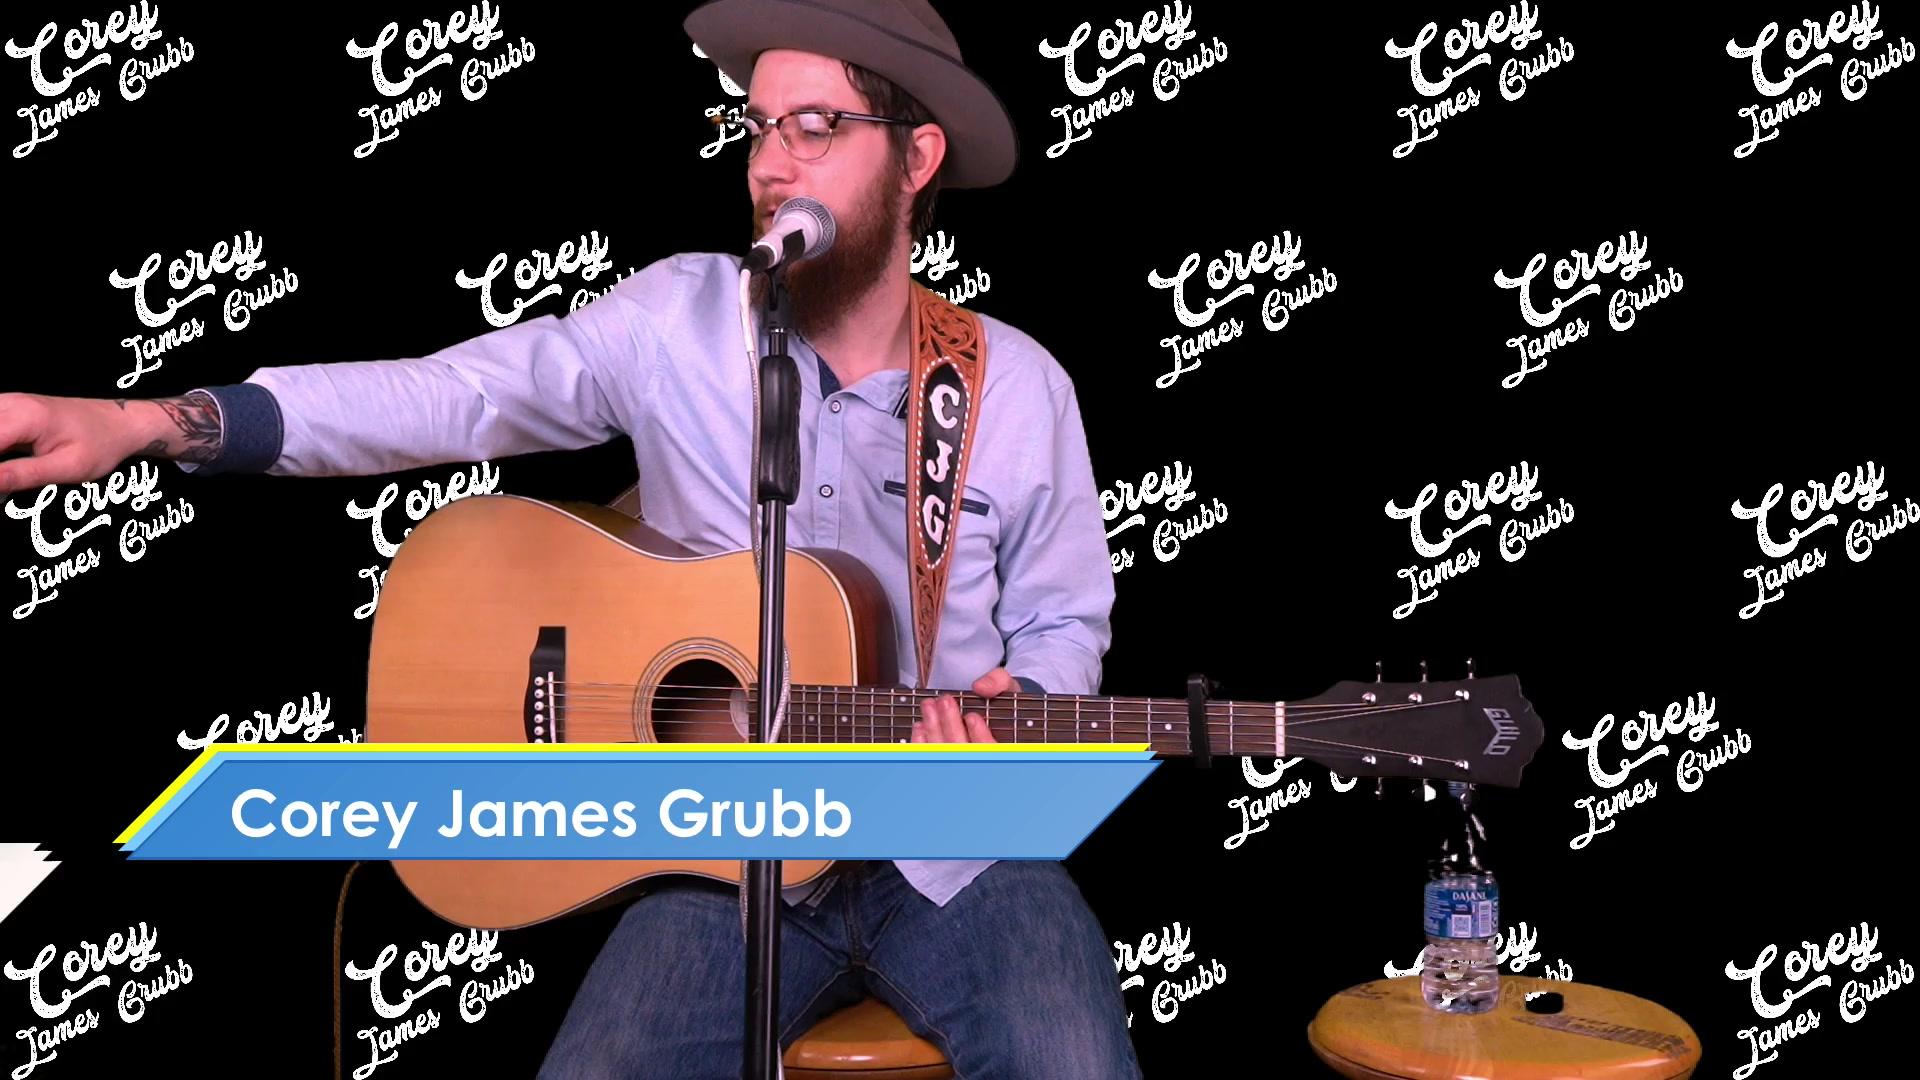 Watch Corey James Grubb Live